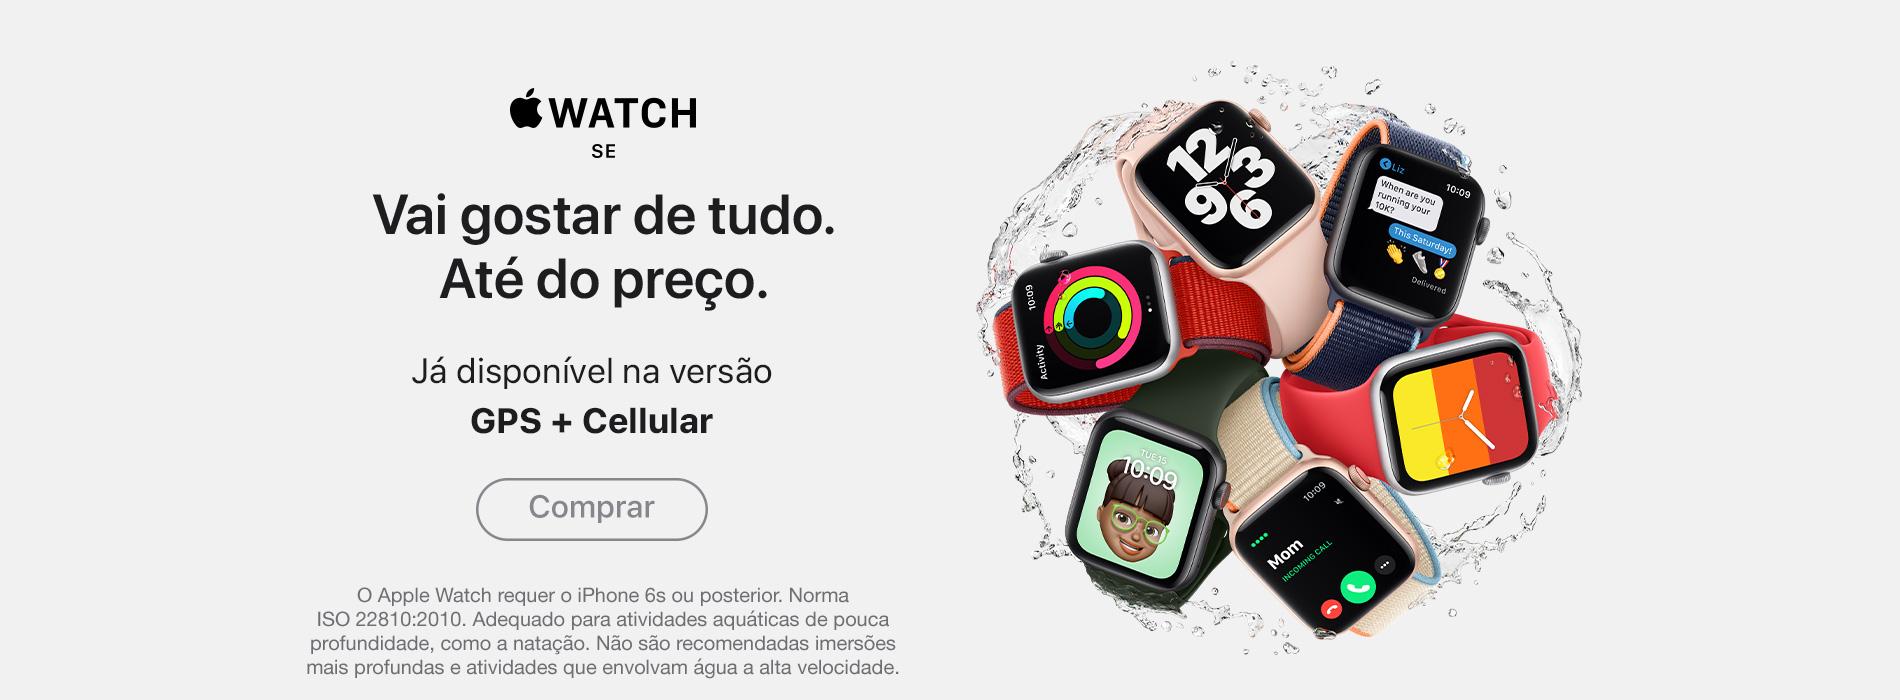 Homepage Slideshow - NPI Watch SE GPS + Cellular